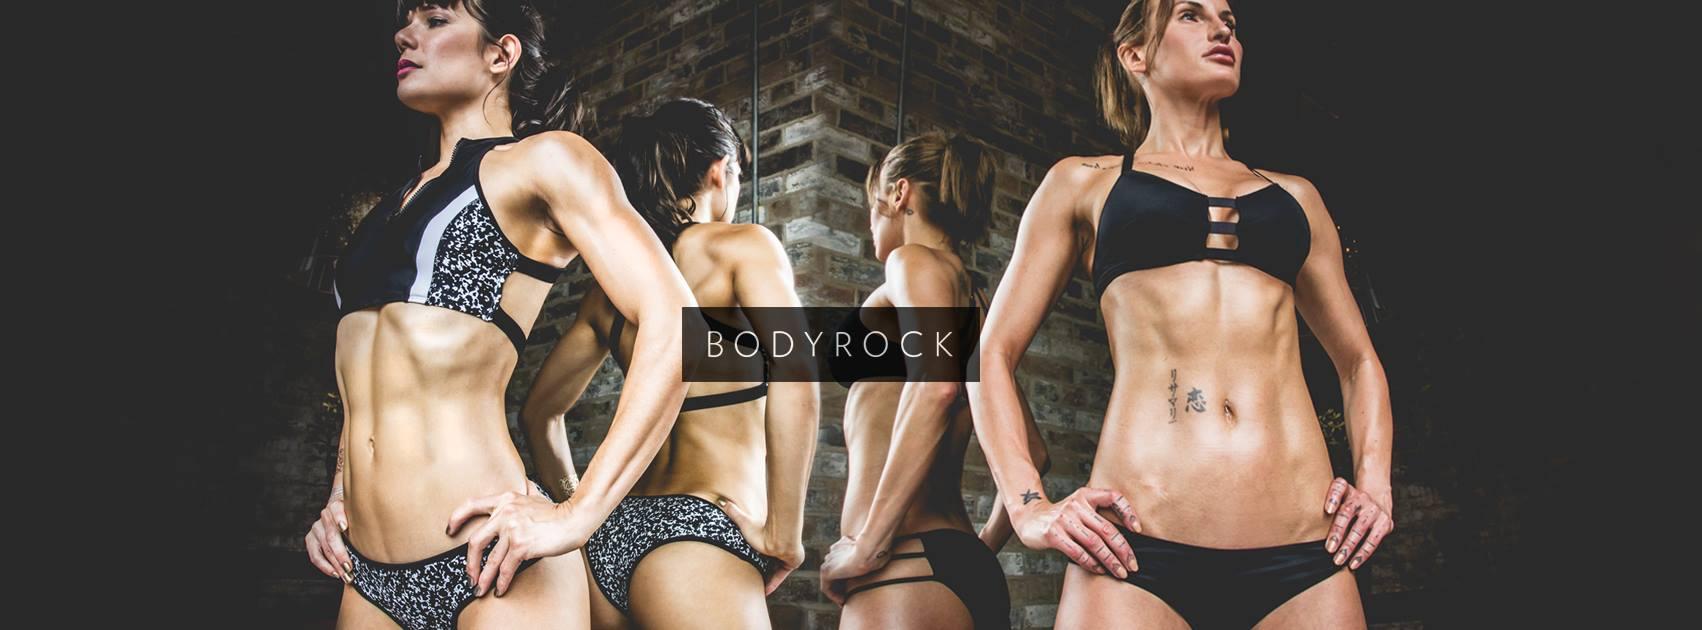 BodyRock Fitness YouTube